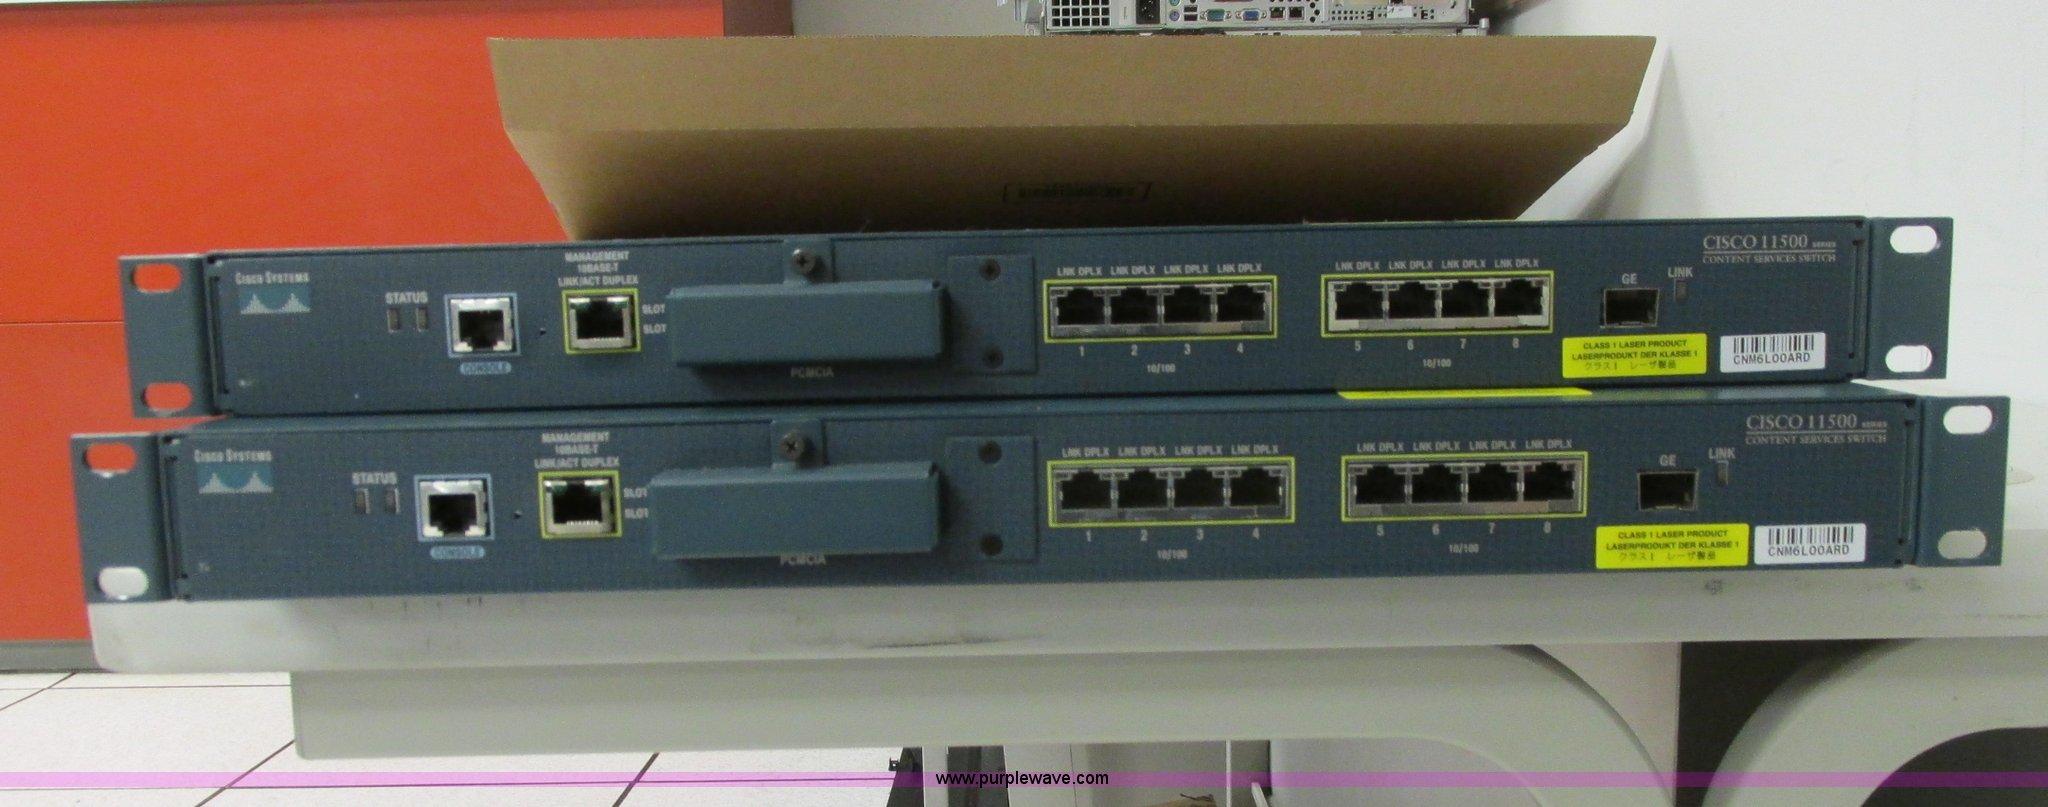 2) Cisco CSS11501 load balancers | Item AZ9748 | SOLD! May